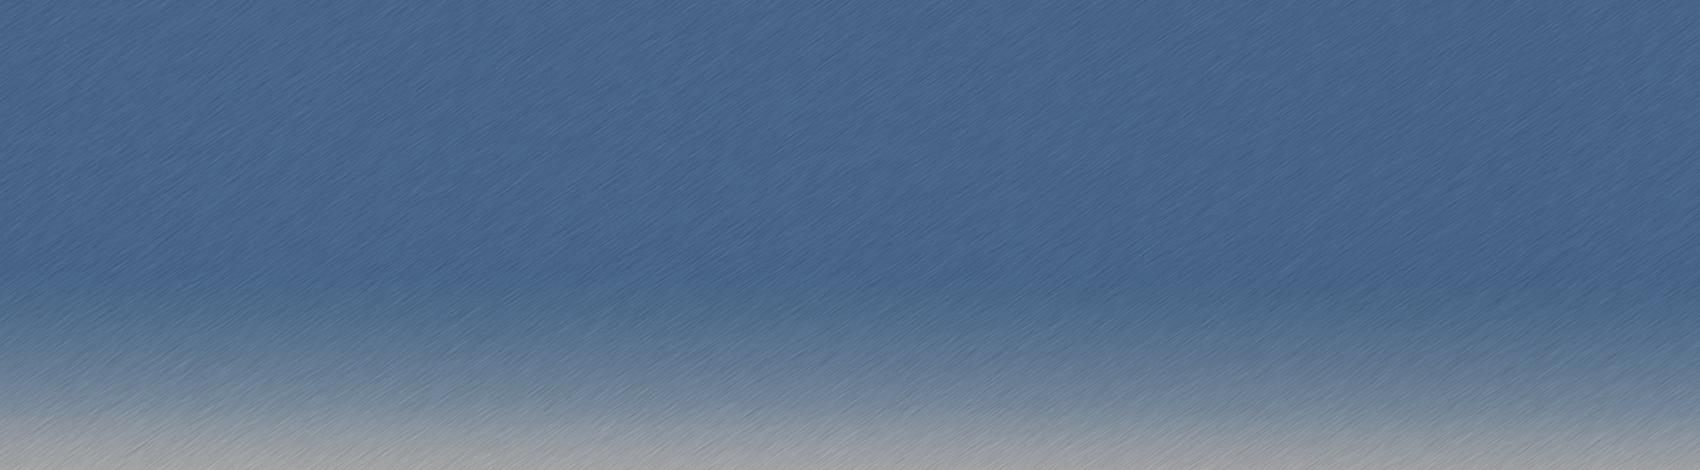 01_Background 1700×470